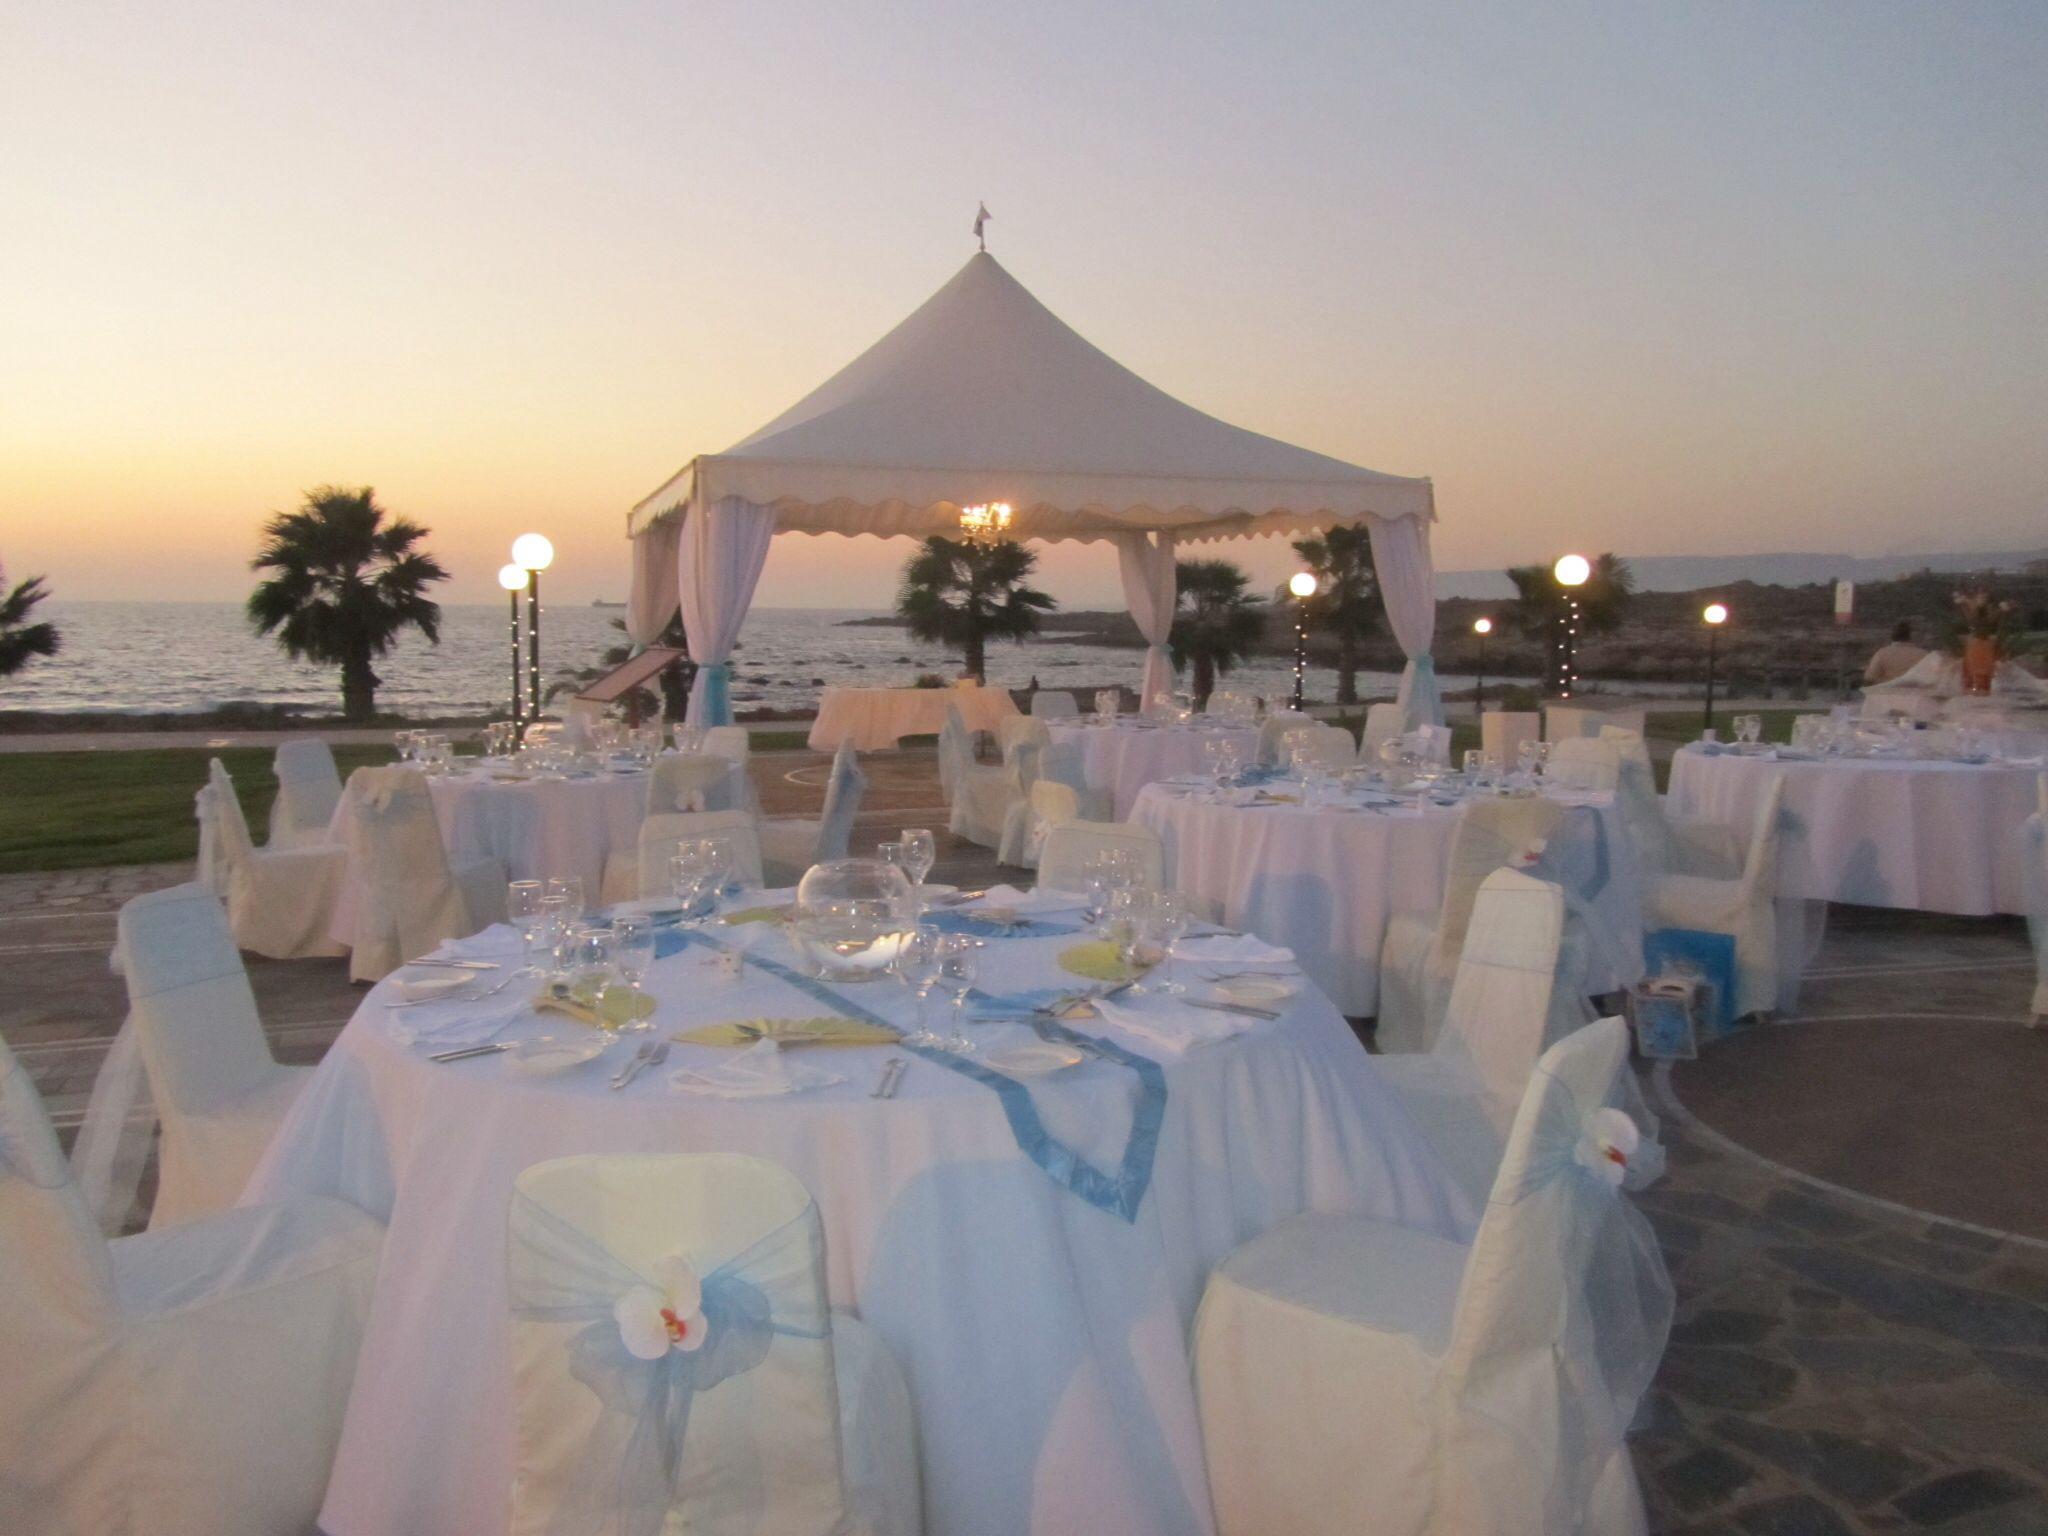 Luxury Wedding Venue With Private Beach: Kefalos Beach Weddings